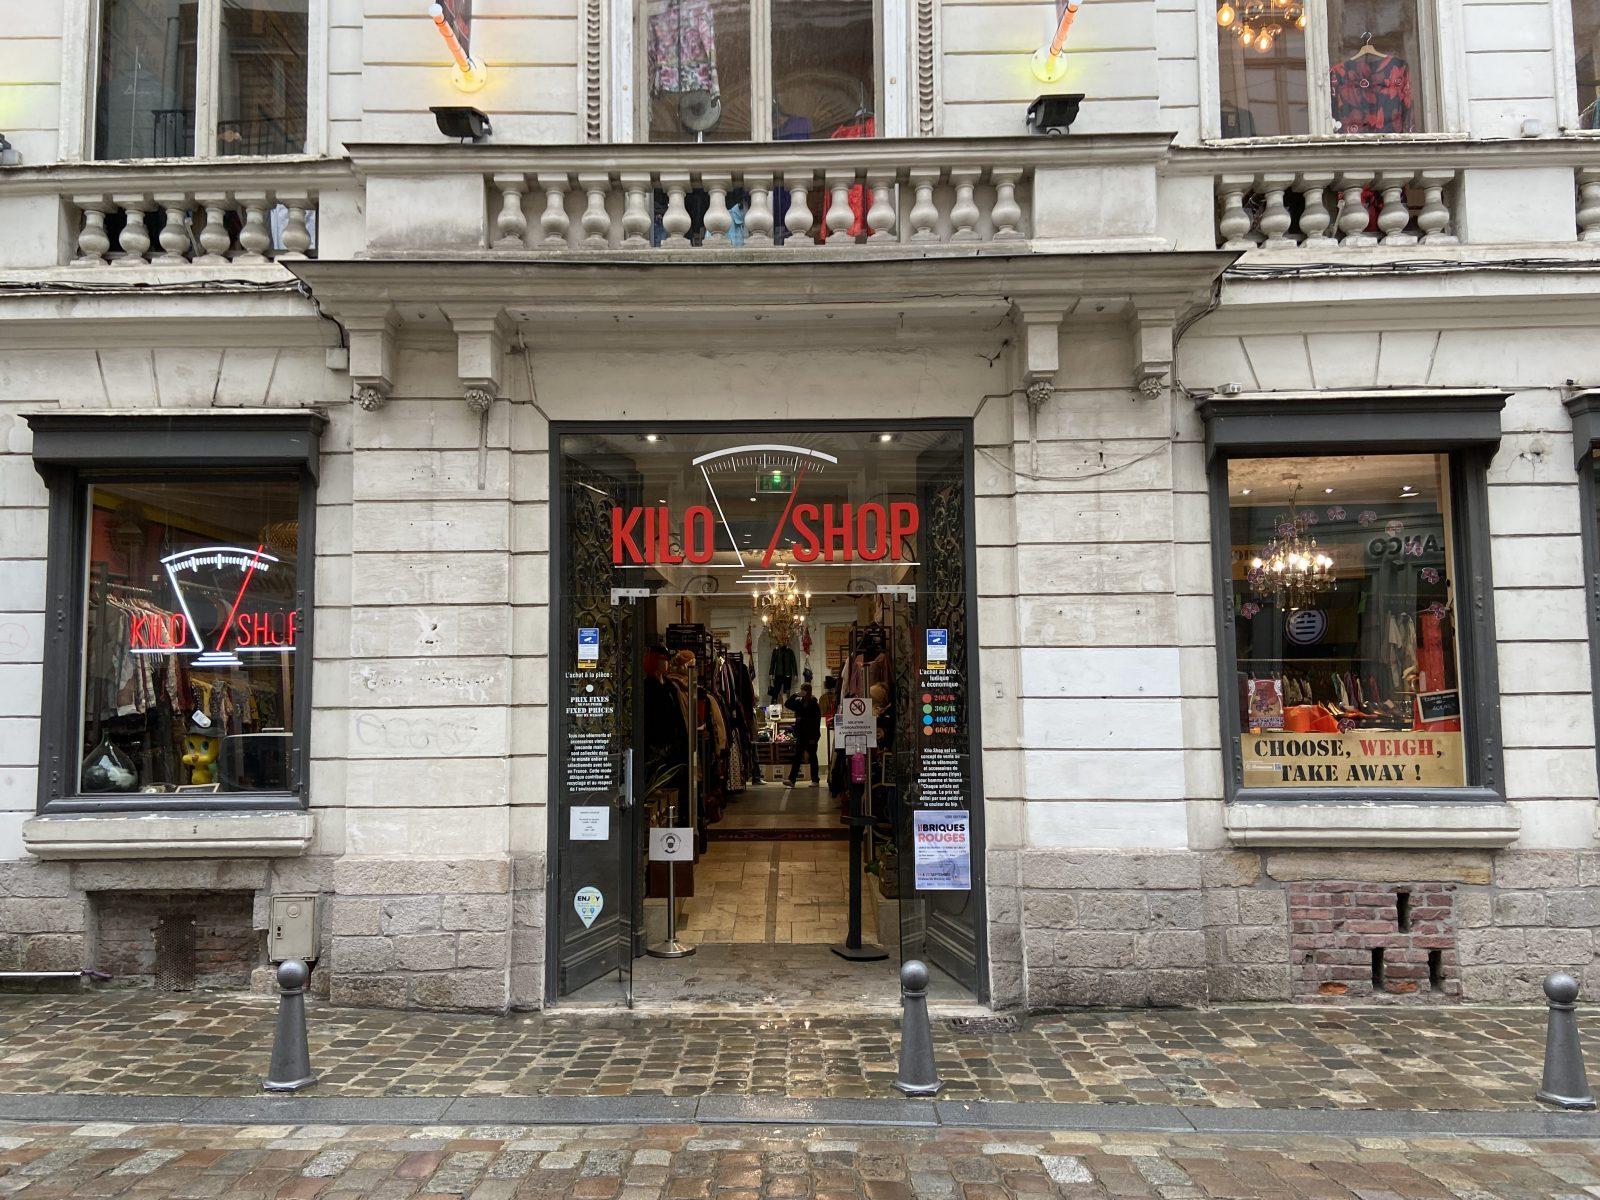 Kilo Shop à Lille, friperie, seconde main